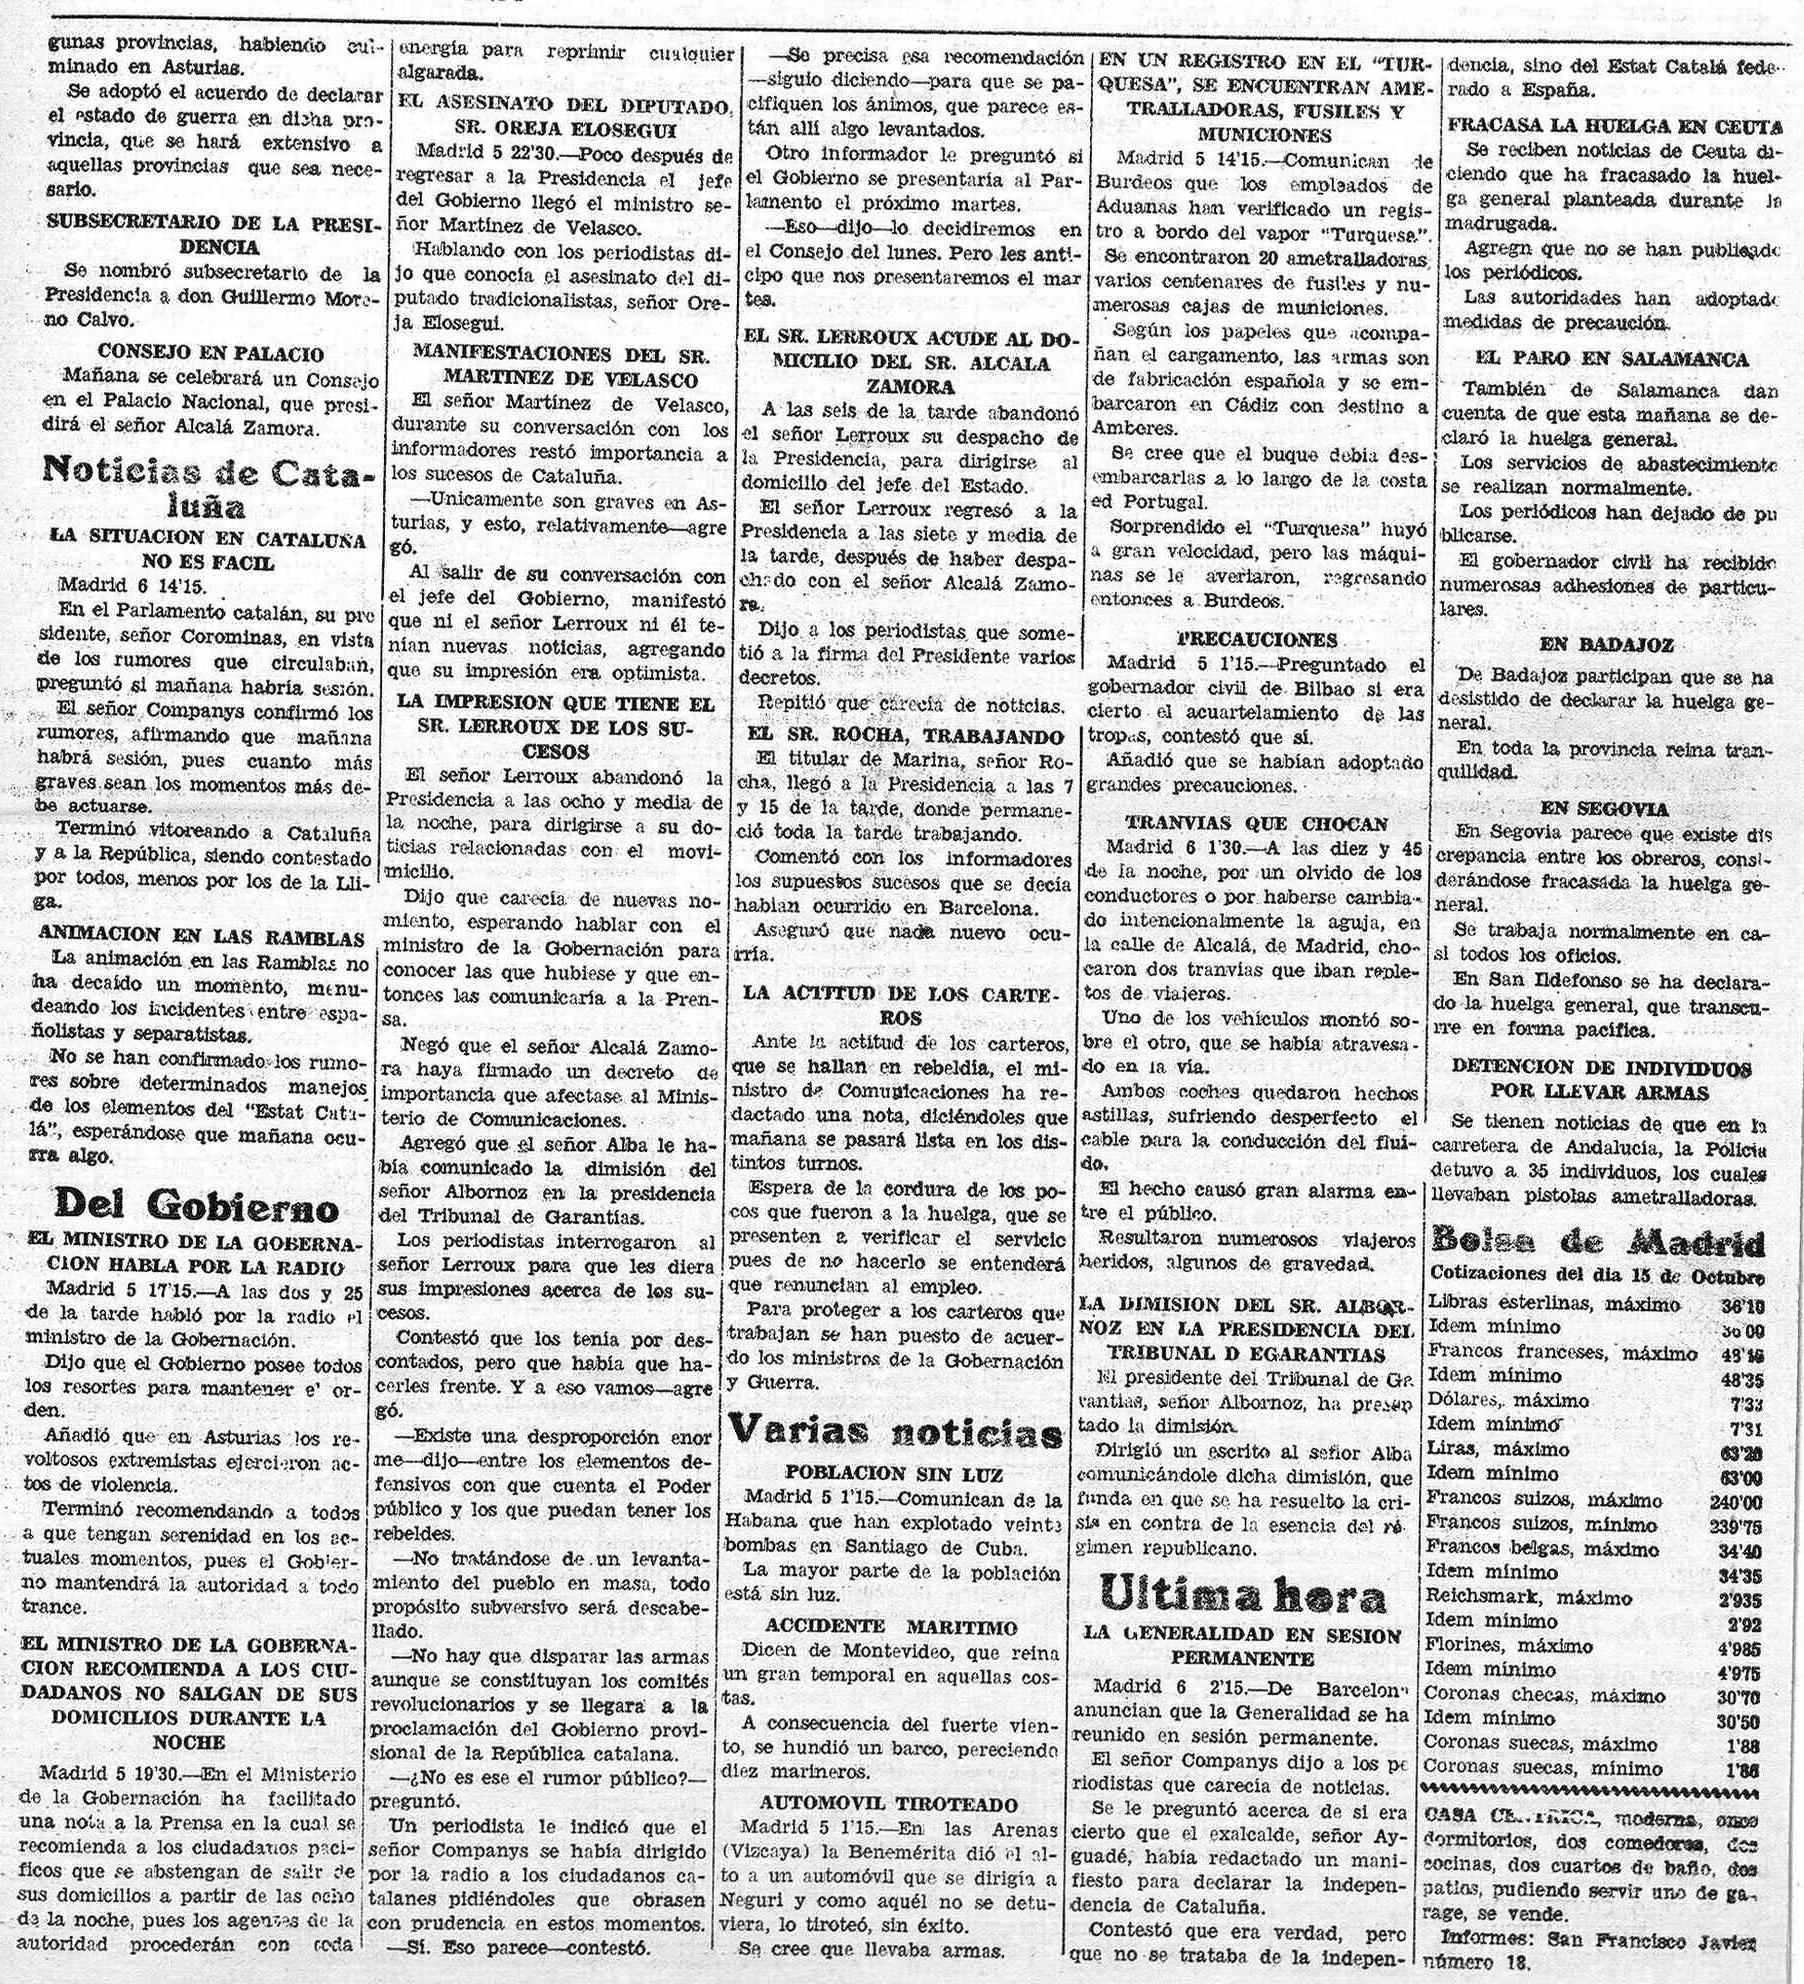 La Gaceta de Tenerife, 6 de octubre de 1934.